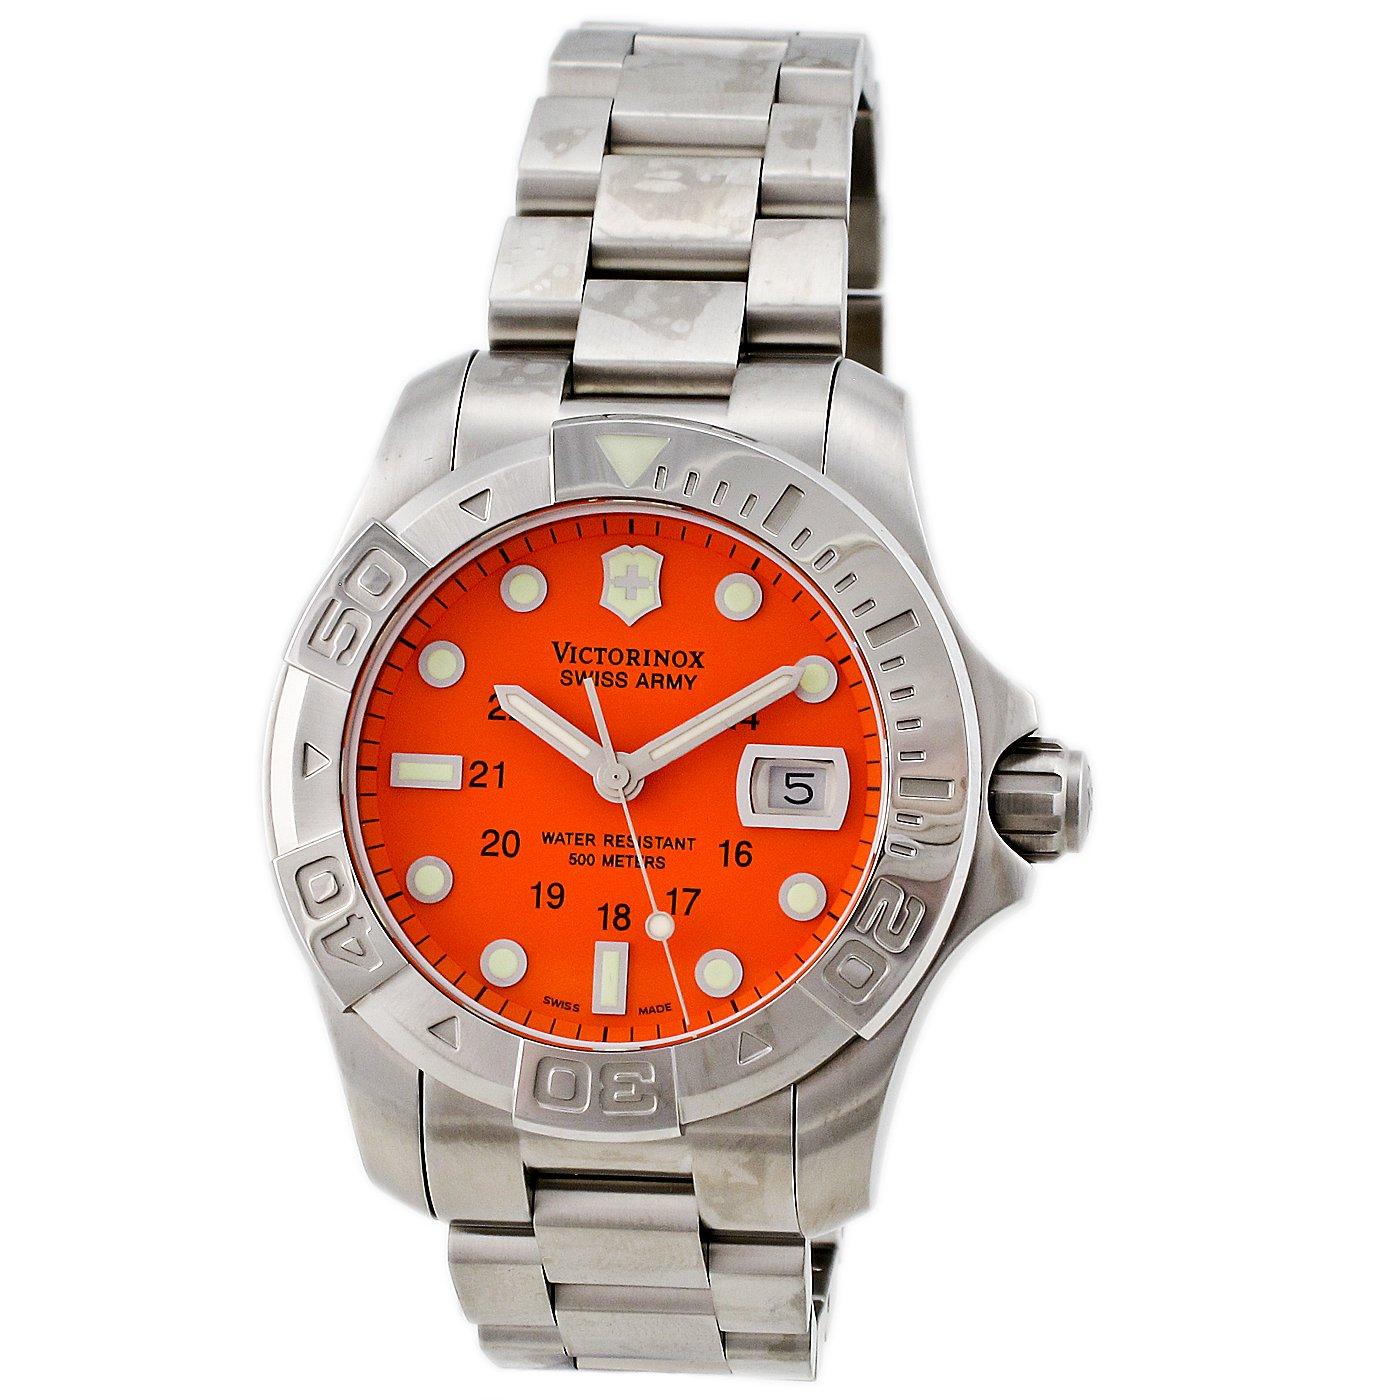 Victorinox swiss army dive master 500 orange dial 194 watch freeks - Orange dive watch ...